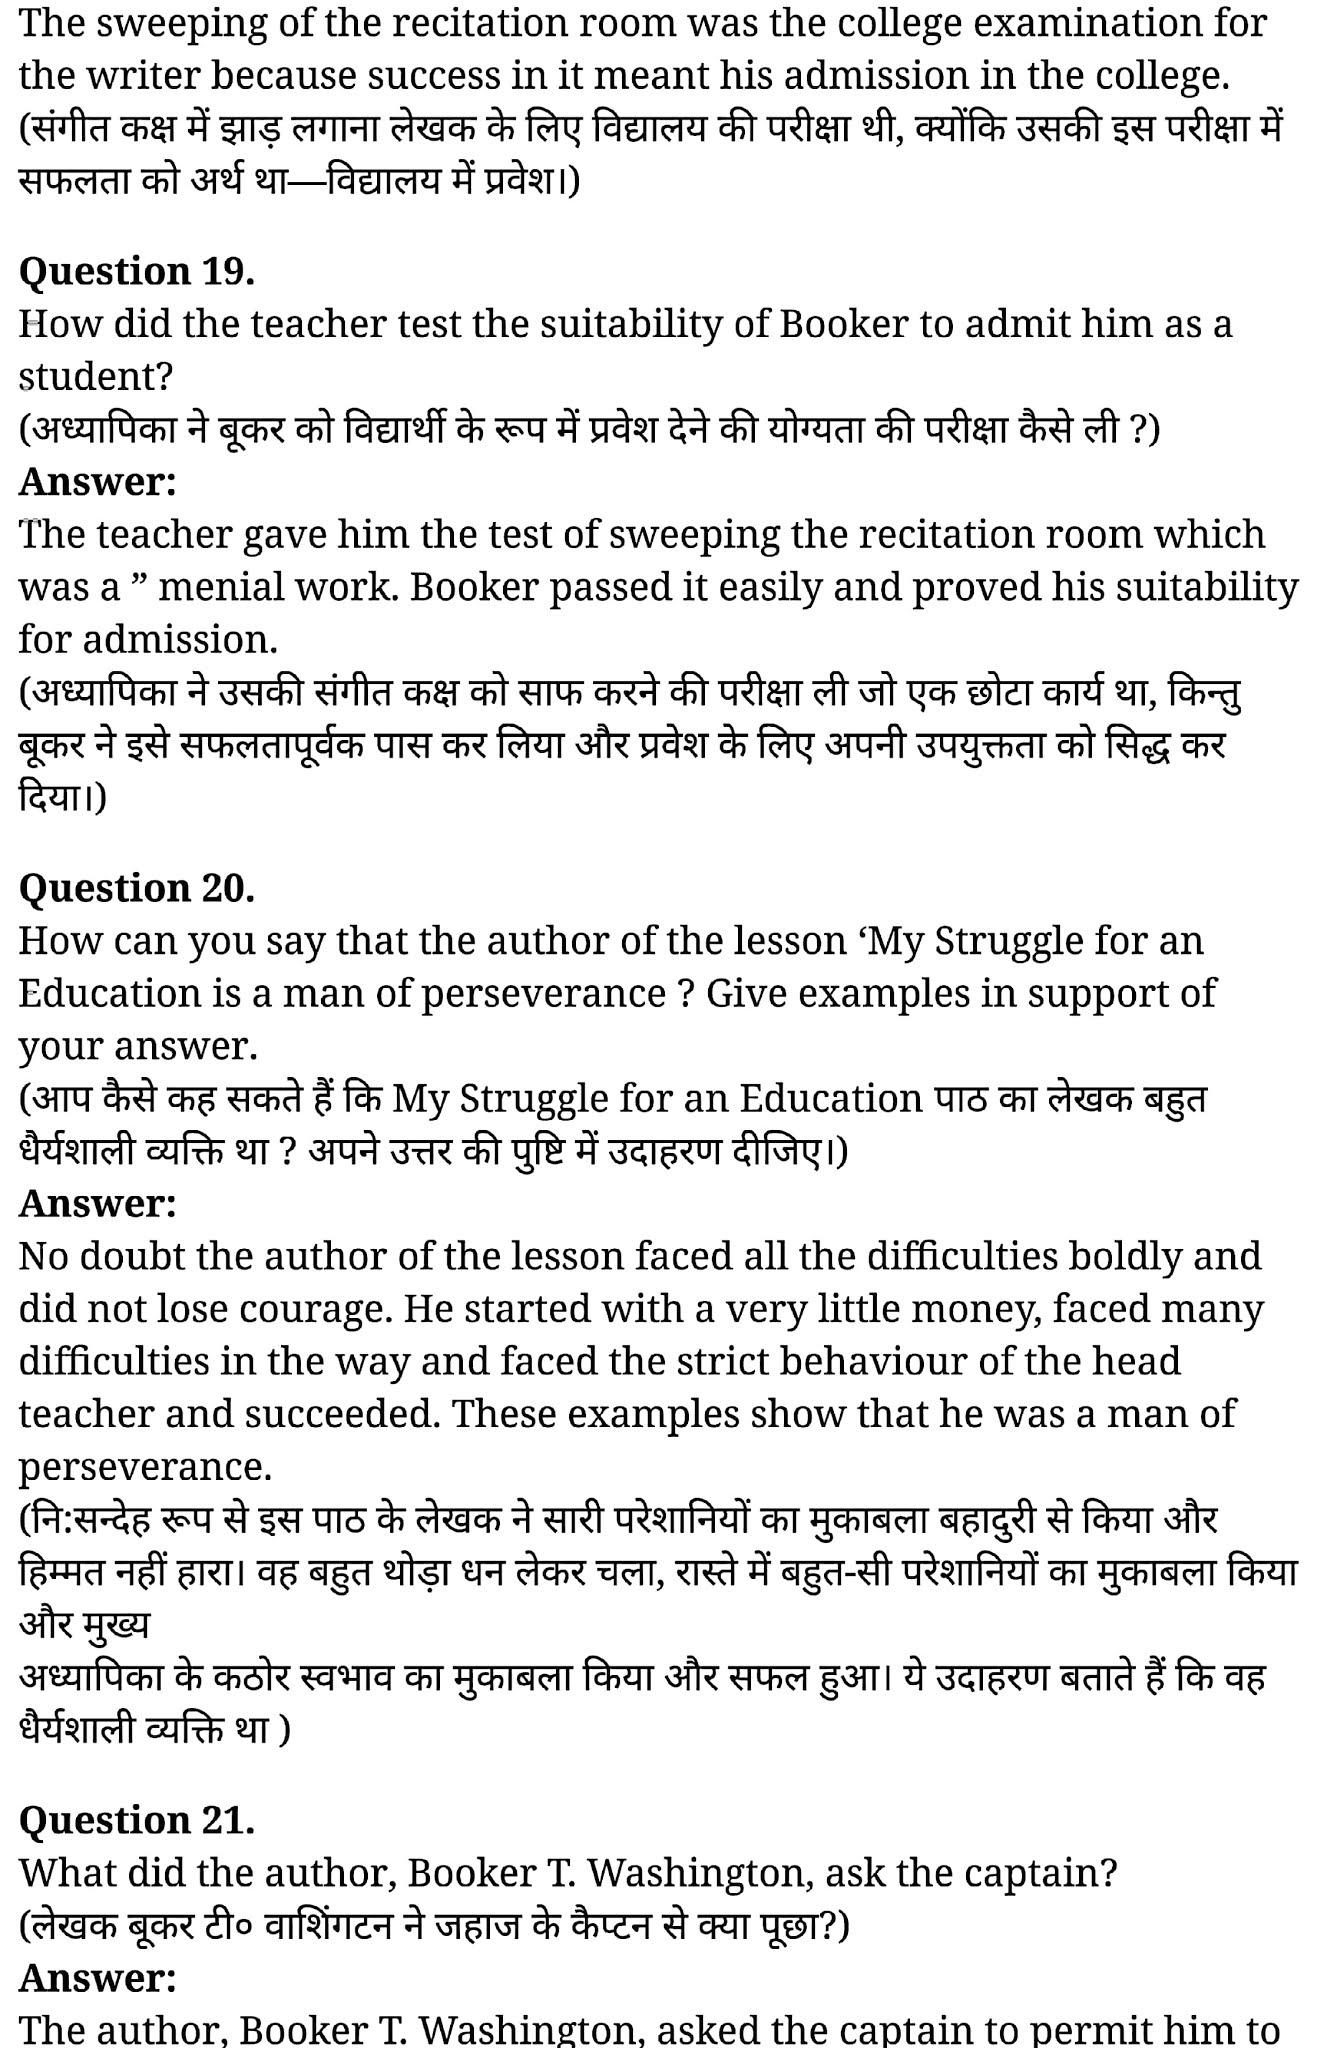 कक्षा 11 अंग्रेज़ी Prose अध्याय 1 के नोट्स हिंदी में एनसीईआरटी समाधान,   class 11 Prose chapter 1 Prose chapter 1,  class 11 Prose chapter 1 Prose chapter 1 ncert solutions in hindi,  class 11 Prose chapter 1 Prose chapter 1 notes in hindi,  class 11 Prose chapter 1 Prose chapter 1 question answer,  class 11 Prose chapter 1 Prose chapter 1 notes,  11   class Prose chapter 1 Prose chapter 1 in hindi,  class 11 Prose chapter 1 Prose chapter 1 in hindi,  class 11 Prose chapter 1 Prose chapter 1 important questions in hindi,  class 11 Prose chapter 1 notes in hindi,  class 11 Prose chapter 1 Prose chapter 1 test,  class 11 Prose chapter 1Prose chapter 1 pdf,  class 11 Prose chapter 1 Prose chapter 1 notes pdf,  class 11 Prose chapter 1 Prose chapter 1 exercise solutions,  class 11 Prose chapter 1 Prose chapter 1, class 11 Prose chapter 1 Prose chapter 1 notes study rankers,  class 11 Prose chapter 1 Prose chapter 1 notes,  class 11 Prose chapter 1 notes,   Prose chapter 1  class 11  notes pdf,  Prose chapter 1 class 11  notes 2021 ncert,   Prose chapter 1 class 11 pdf,    Prose chapter 1  book,     Prose chapter 1 quiz class 11  ,       11  th Prose chapter 1    book up board,       up board 11  th Prose chapter 1 notes,  कक्षा 11 अंग्रेज़ी Prose अध्याय 1, कक्षा 11 अंग्रेज़ी का Prose अध्याय 1 ncert solution in hindi, कक्षा 11 अंग्रेज़ी के Prose अध्याय 1 के नोट्स हिंदी में, कक्षा 11 का अंग्रेज़ीProse अध्याय 1का प्रश्न उत्तर, कक्षा 11 अंग्रेज़ी Prose अध्याय 1के नोट्स, 11 कक्षा अंग्रेज़ी Prose अध्याय 1 हिंदी में,कक्षा 11 अंग्रेज़ी Prose अध्याय 1 हिंदी में, कक्षा 11 अंग्रेज़ी Prose अध्याय 1महत्वपूर्ण प्रश्न हिंदी में,कक्षा 11 के अंग्रेज़ीके नोट्स हिंदी में,अंग्रेज़ी कक्षा 11 नोट्स pdf,  अंग्रेज़ी  कक्षा 11 नोट्स 2021 ncert,  अंग्रेज़ी  कक्षा 11 pdf,  अंग्रेज़ी  पुस्तक,  अंग्रेज़ी की बुक,  अंग्रेज़ी  प्रश्नोत्तरी class 11  , 11   वीं अंग्रेज़ी  पुस्तक up board,  बिहार बोर्ड 11  पुस्तक वीं अंग्रेज़ी नोट्स,